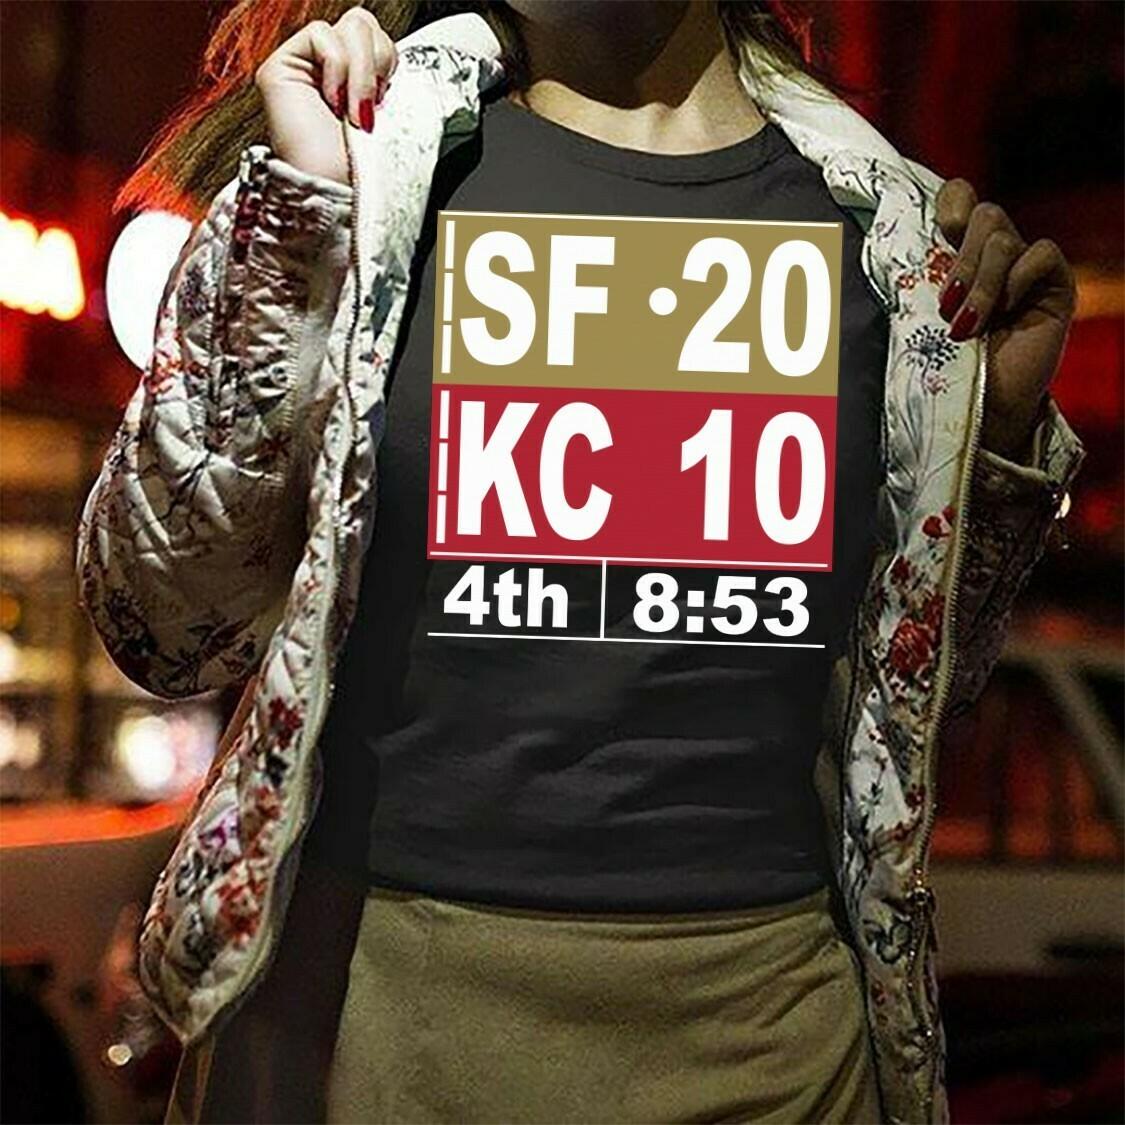 SF 20 KC 10 T-Shirt Hoodie Sweatshirt Sweater Tee Kids Youth Gifts Jolly Family Gifts